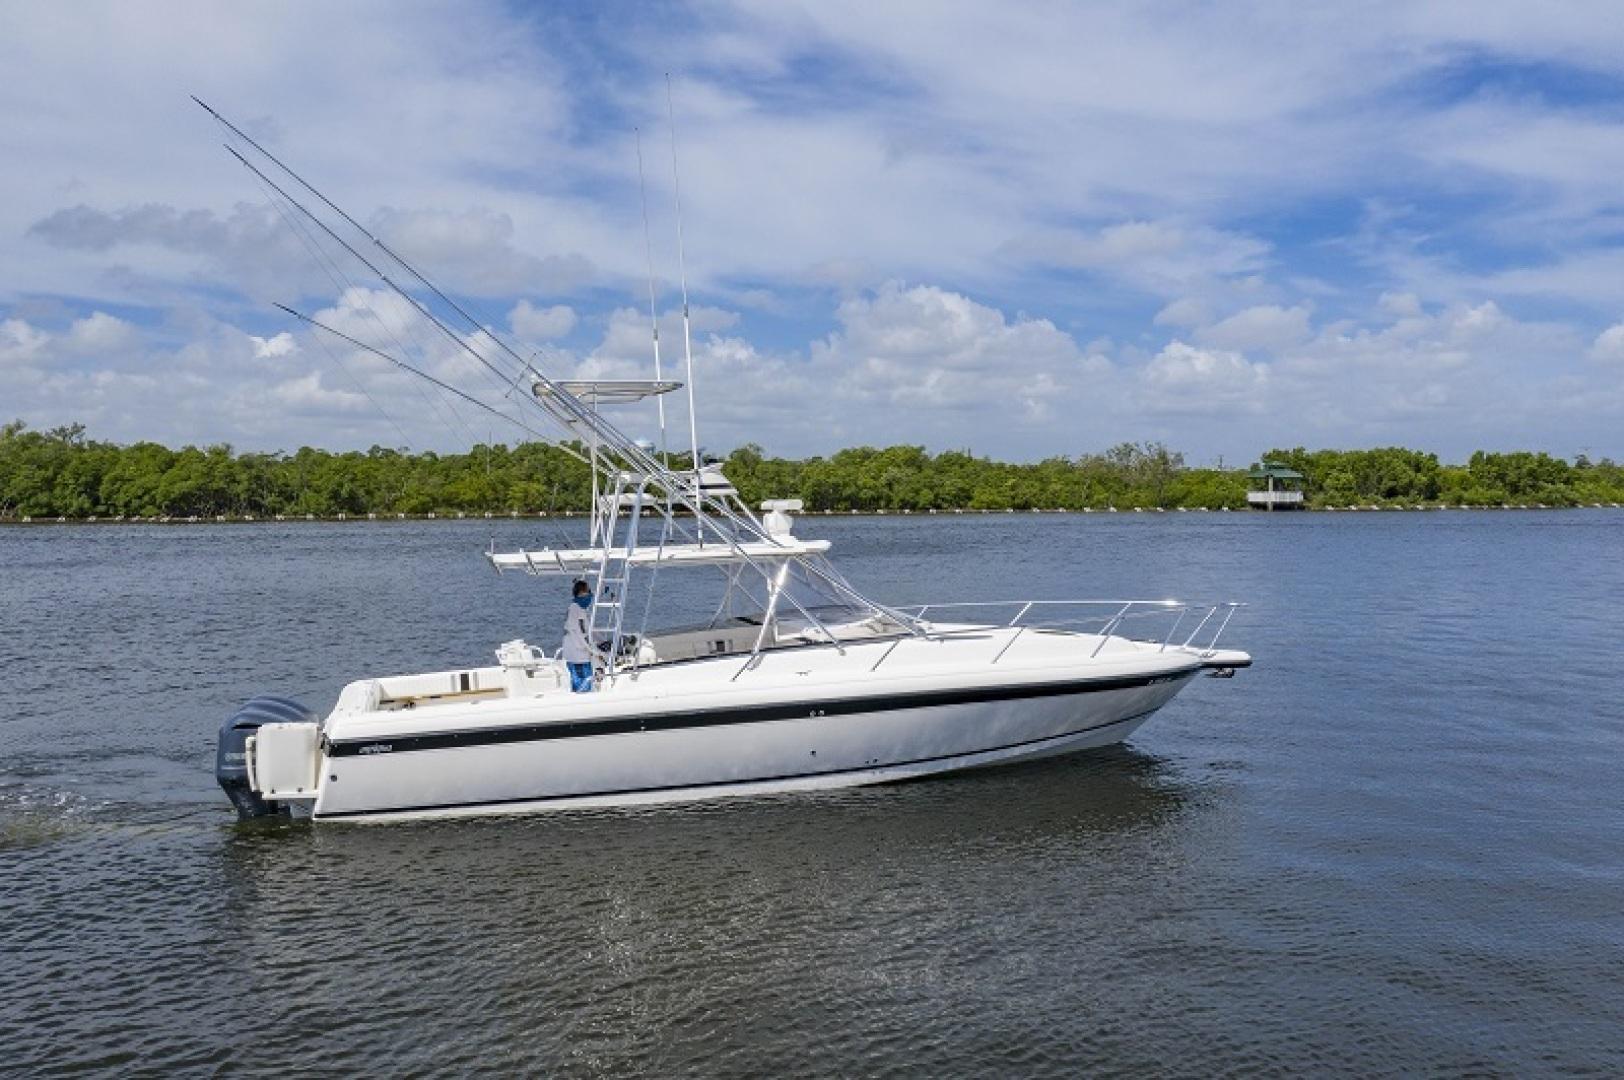 Intrepid-377 Walkaround 2005-Rock Boat REFIT 2018 Dania Beach-Florida-United States-377 Intrepid Profile-1511399 | Thumbnail